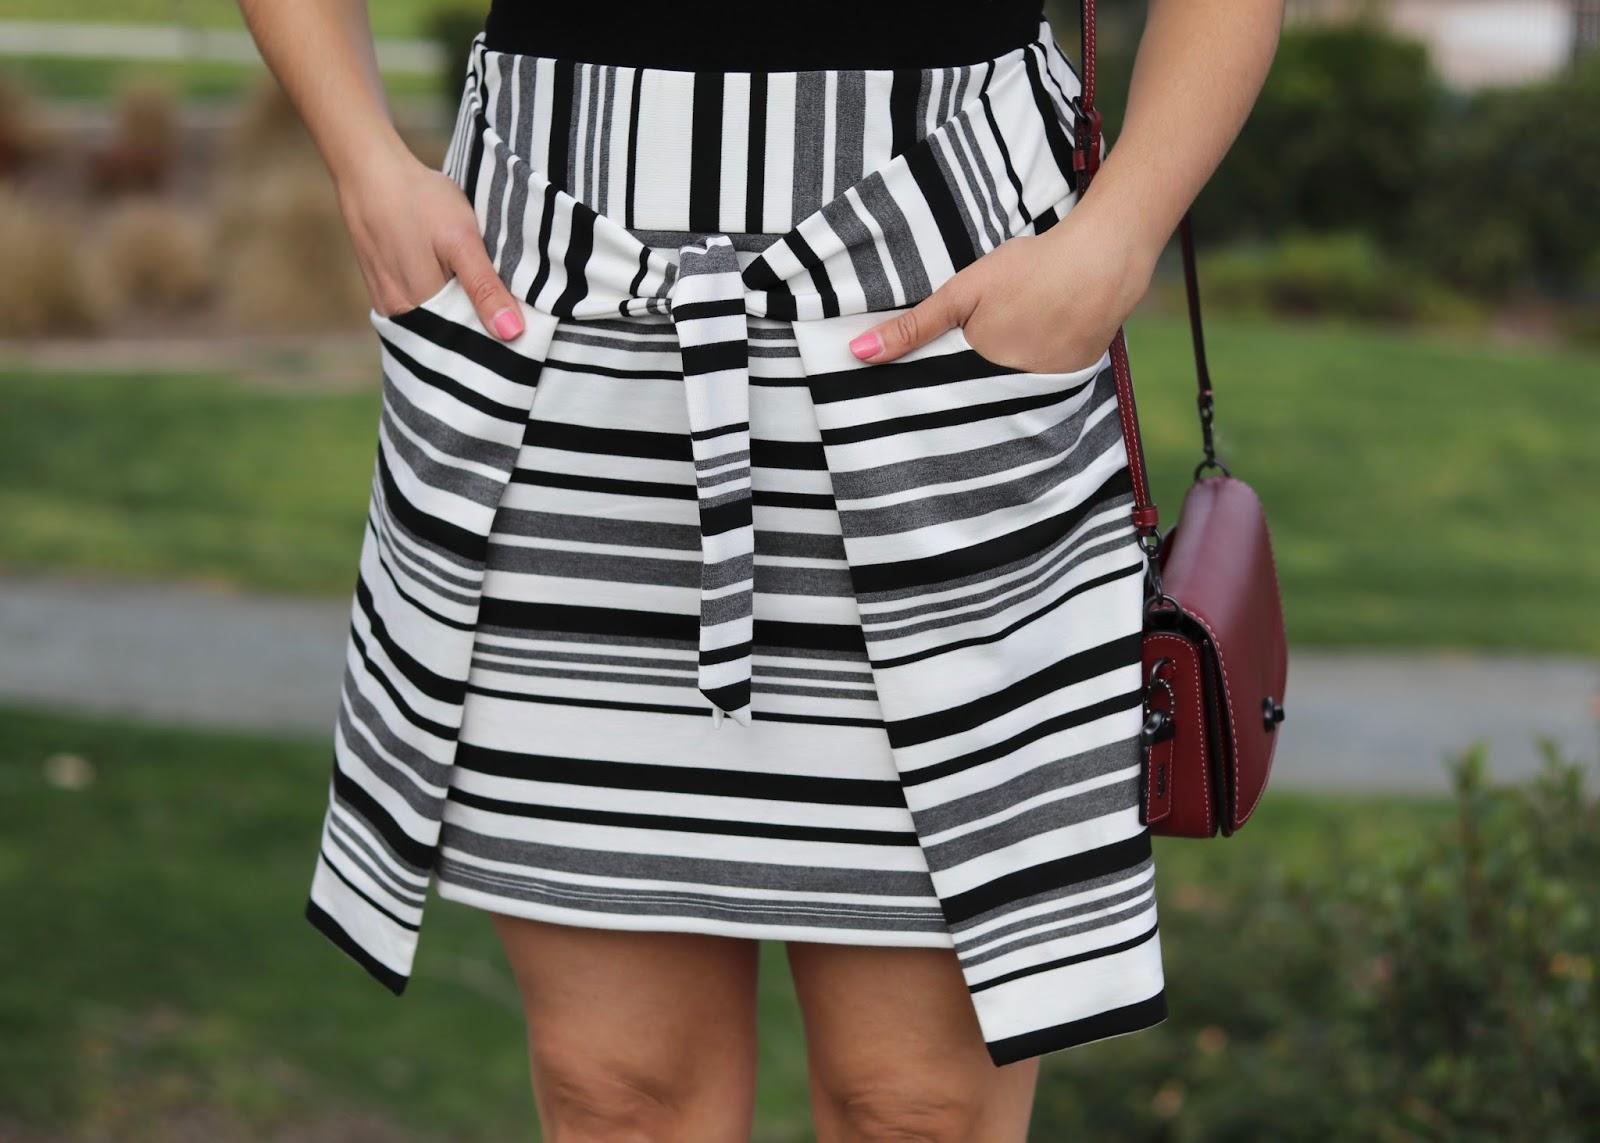 cabi Spring 2017 collection, cabi 2017 blogger, cabi outfit idea